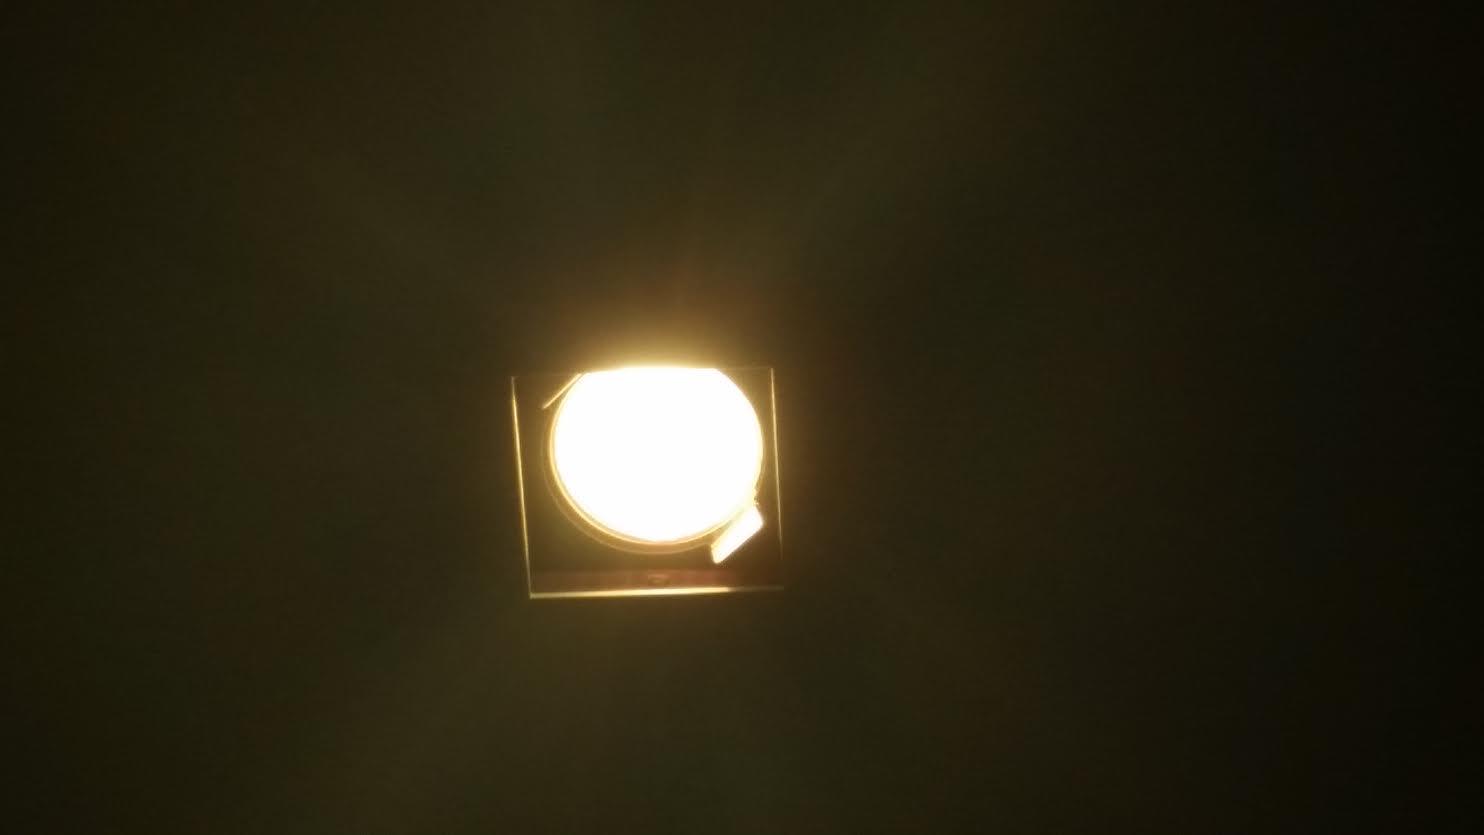 Se ljuset i tunneln